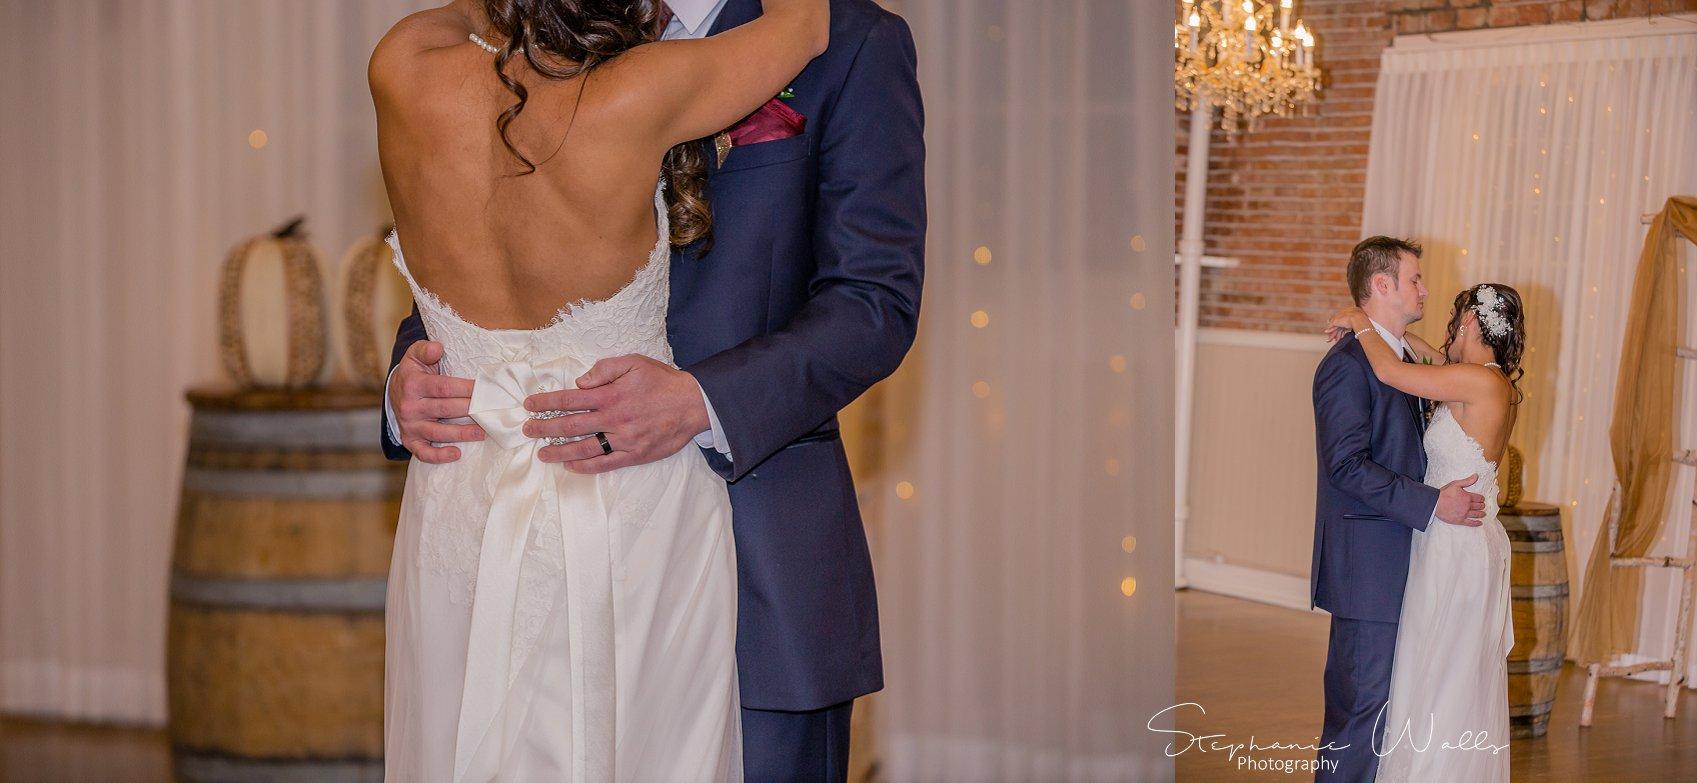 1st Dance Dancing 030 1 KK & Zack   Hollywood Schoolhouse Wedding   Woodinville, Wa Wedding Photographer